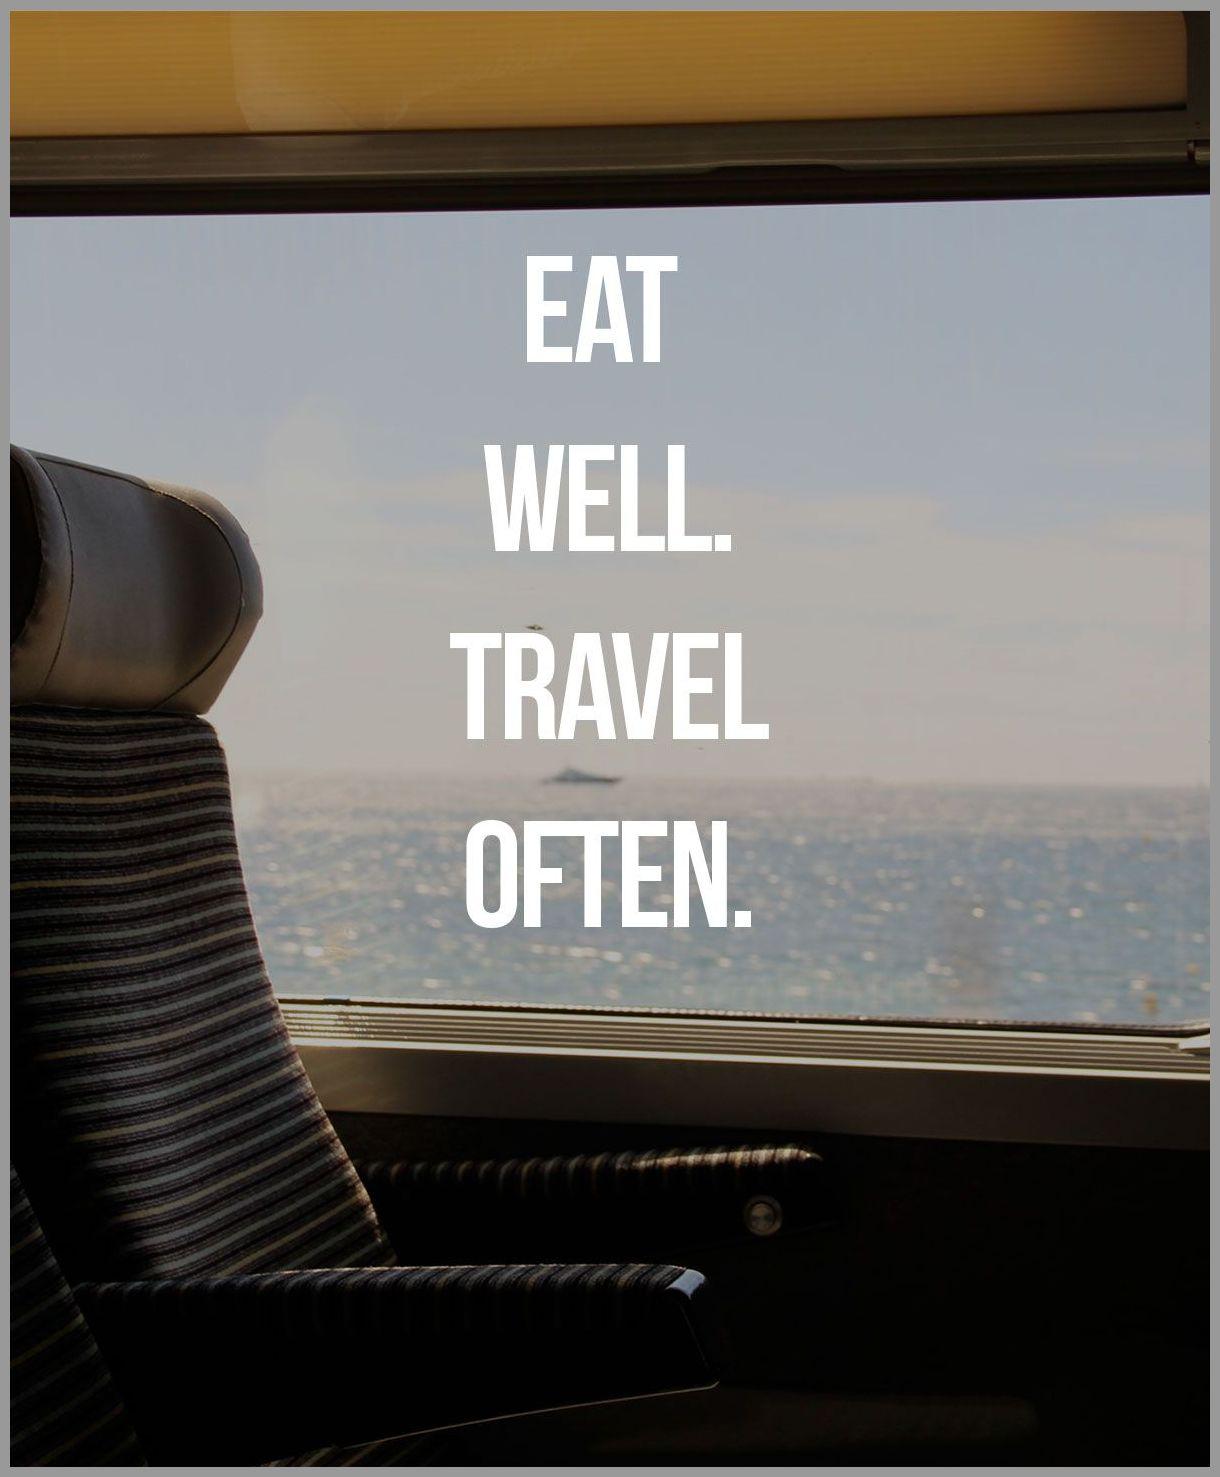 Eat well travel often - Eat well travel often